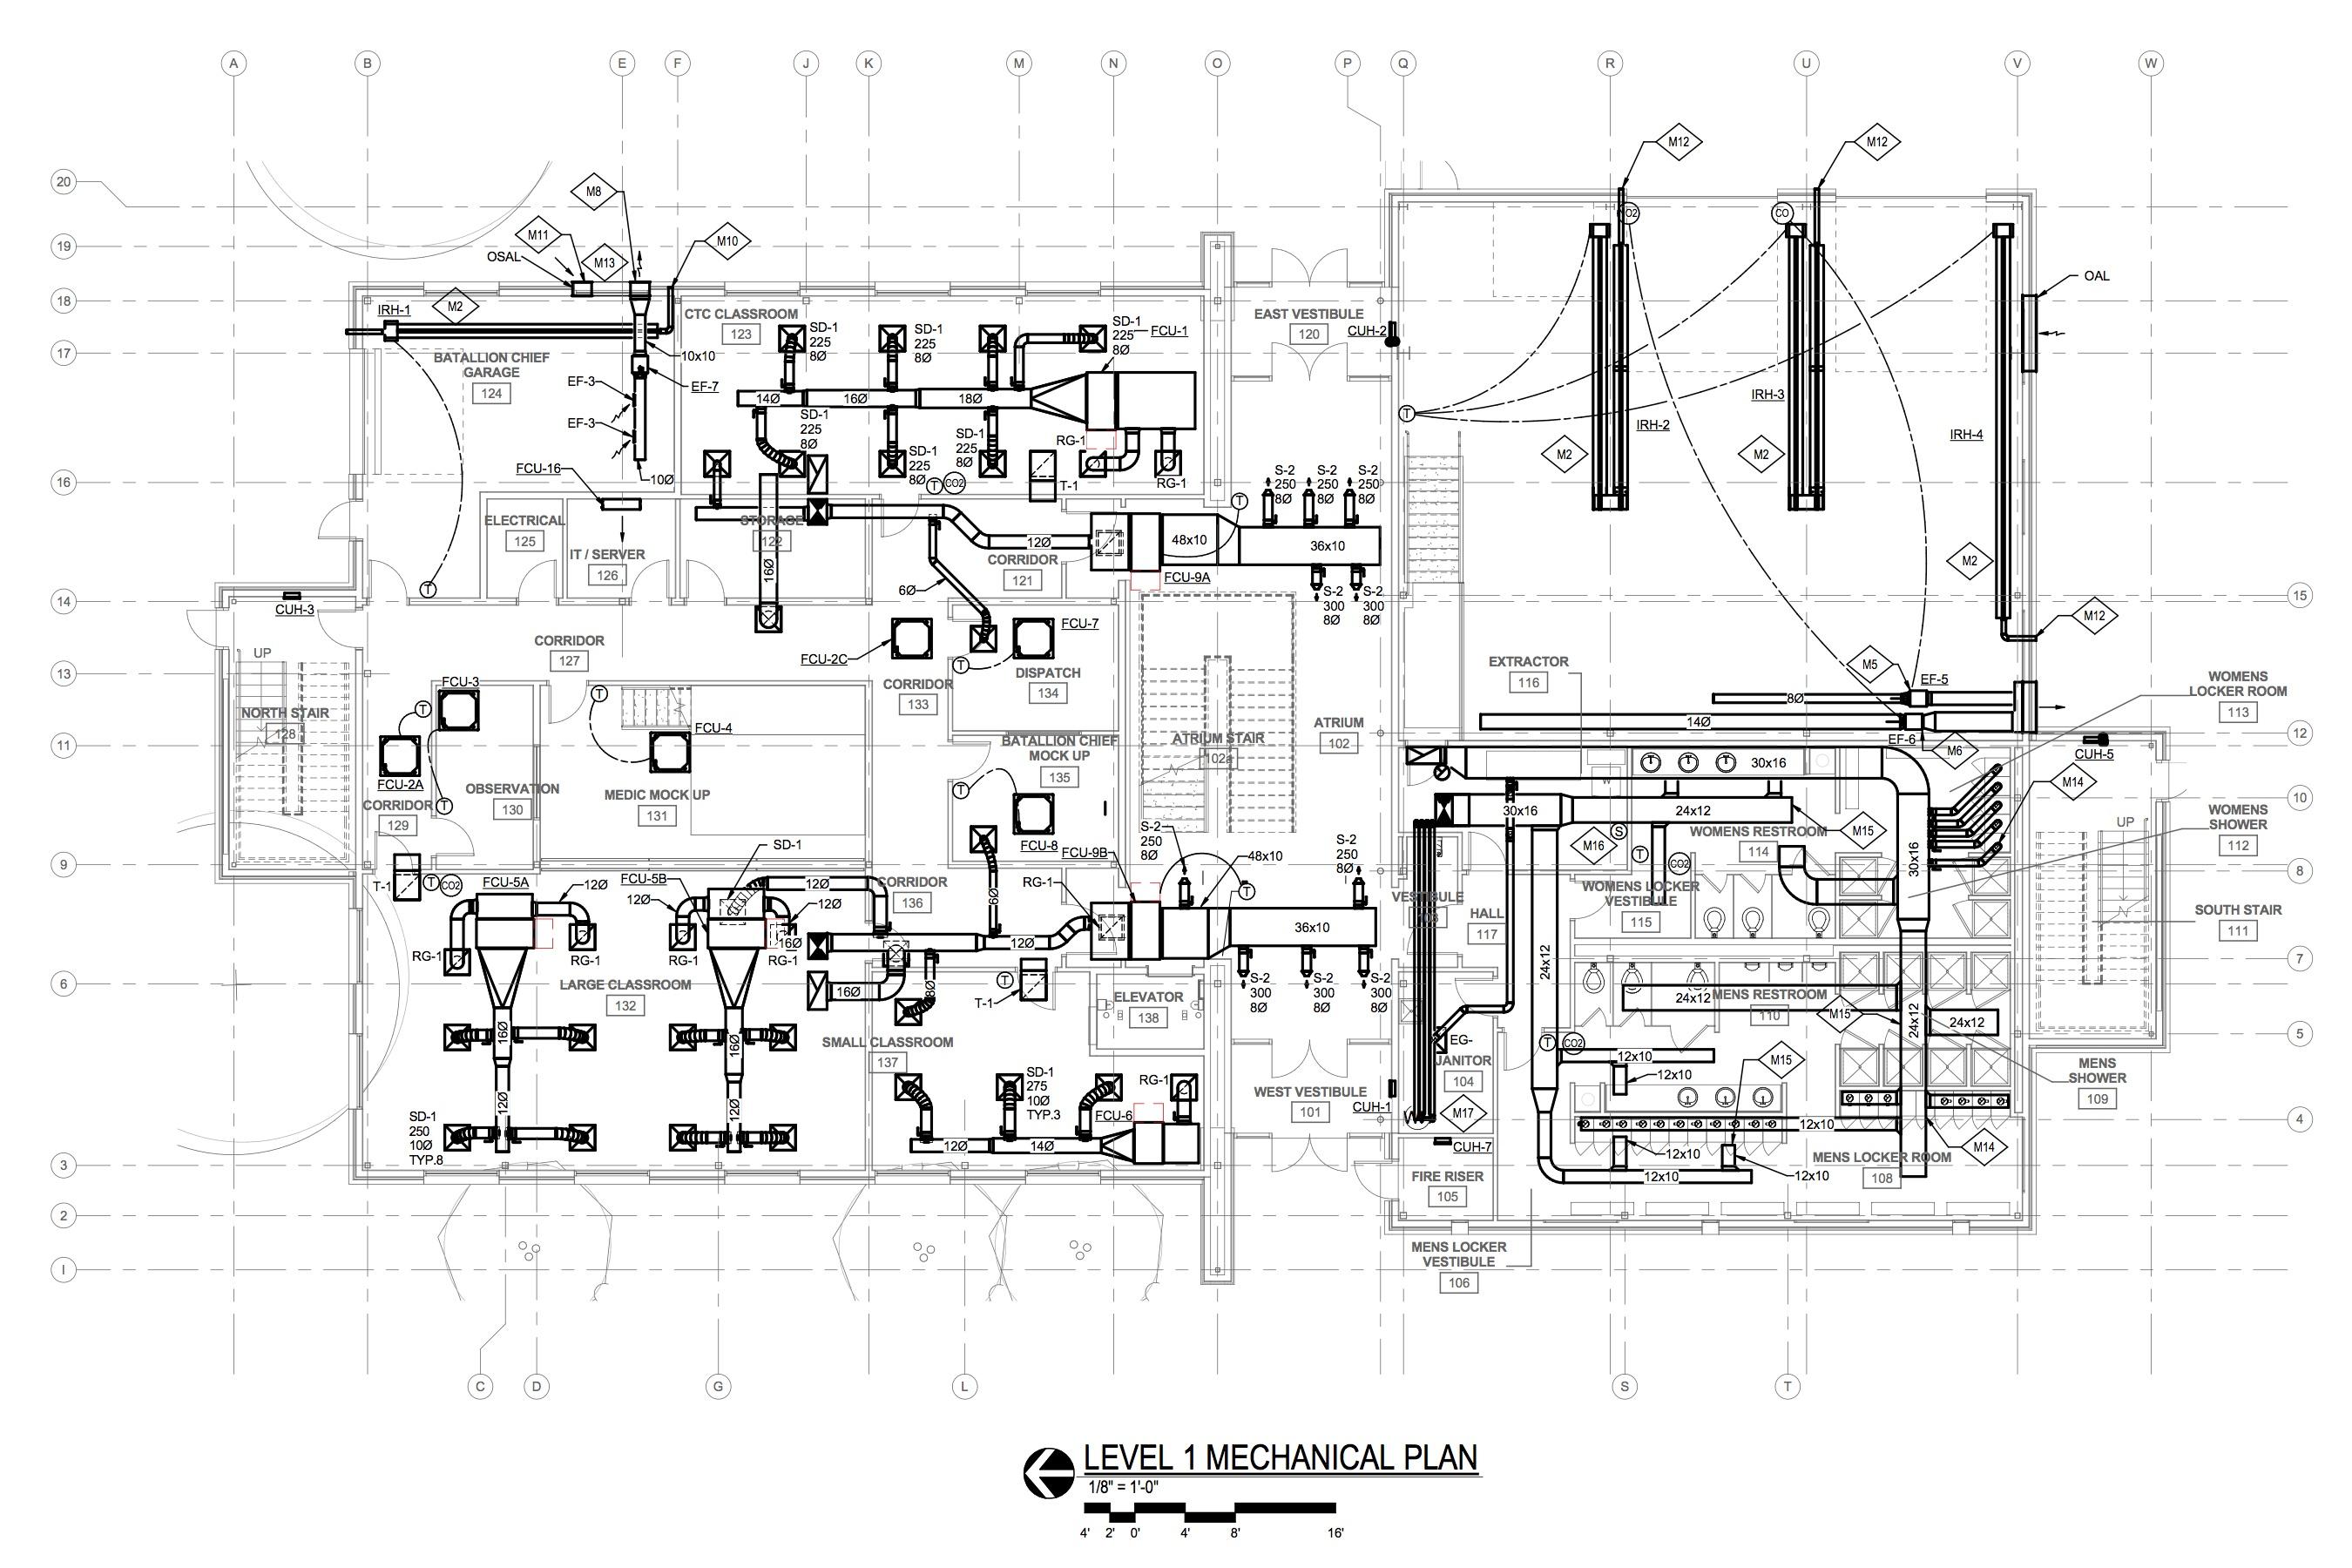 SMFD Level 1 Mech Plan_SMFR Preparedness Building